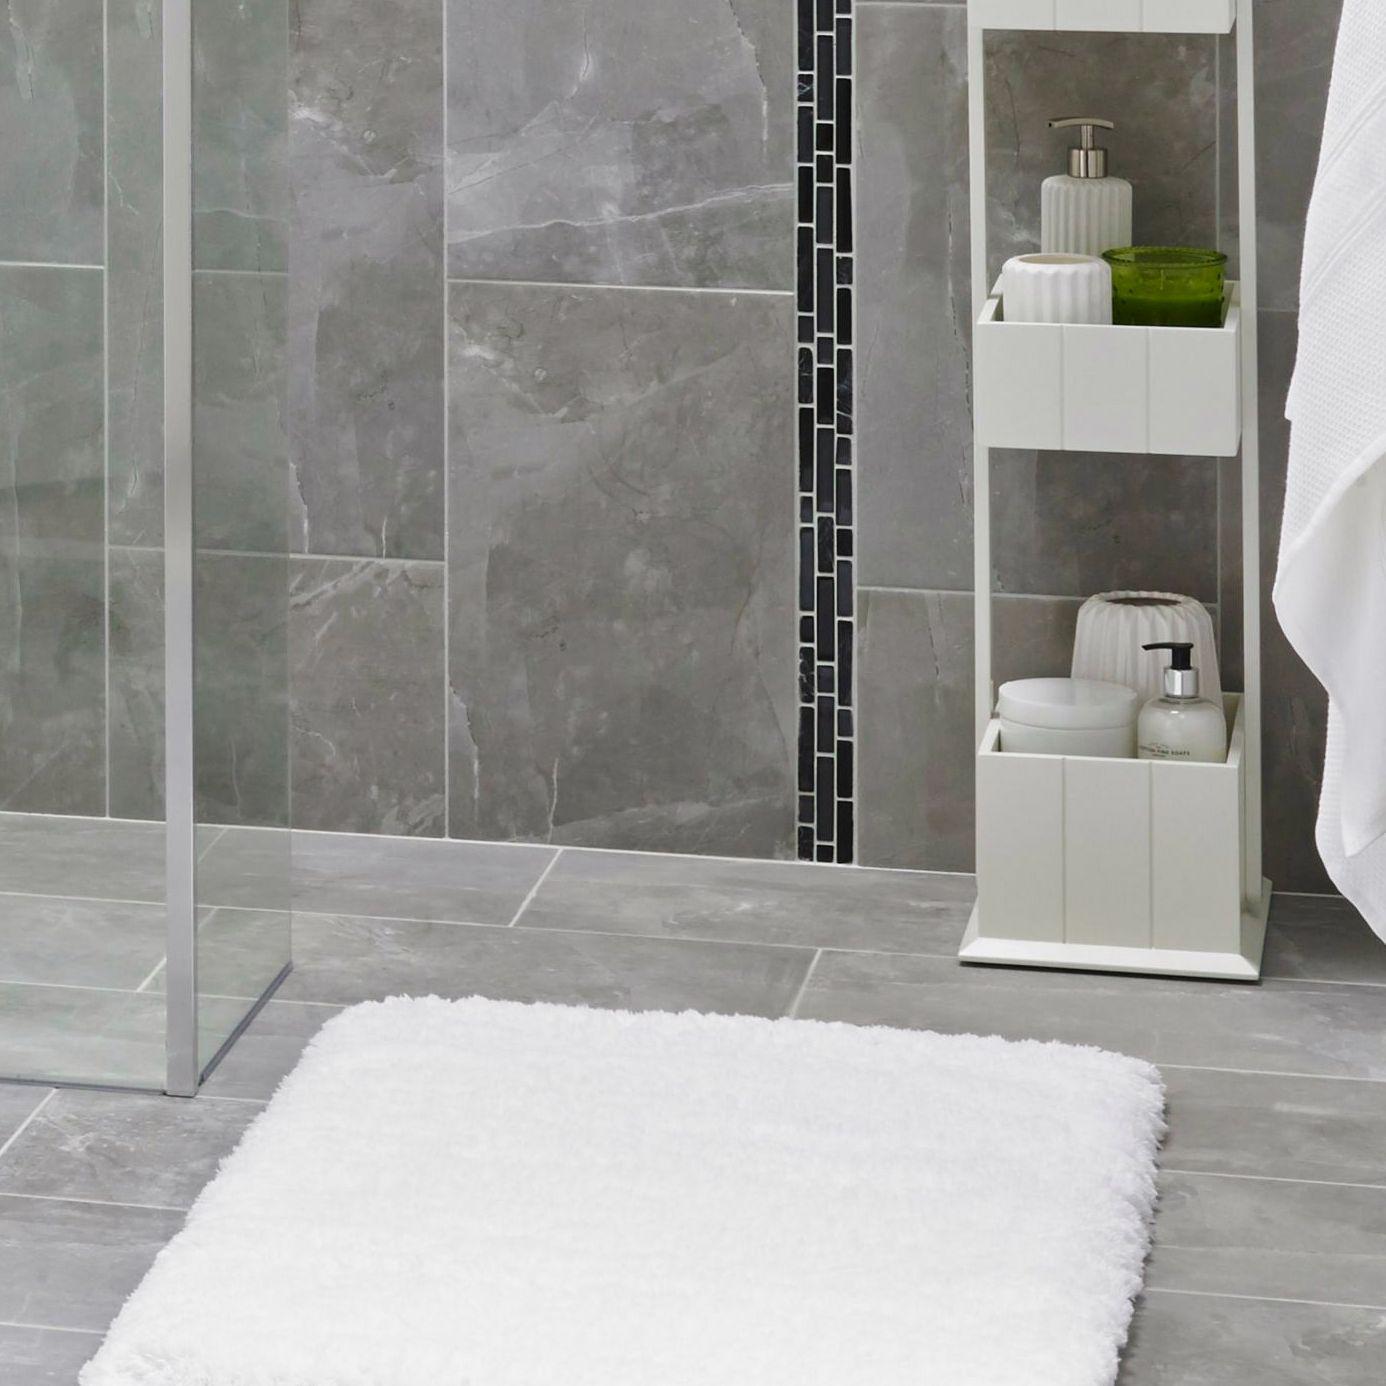 Bathroom Tiles B Q arlington tile range | floor & wall tiles | diy at b&q | diy at b&q